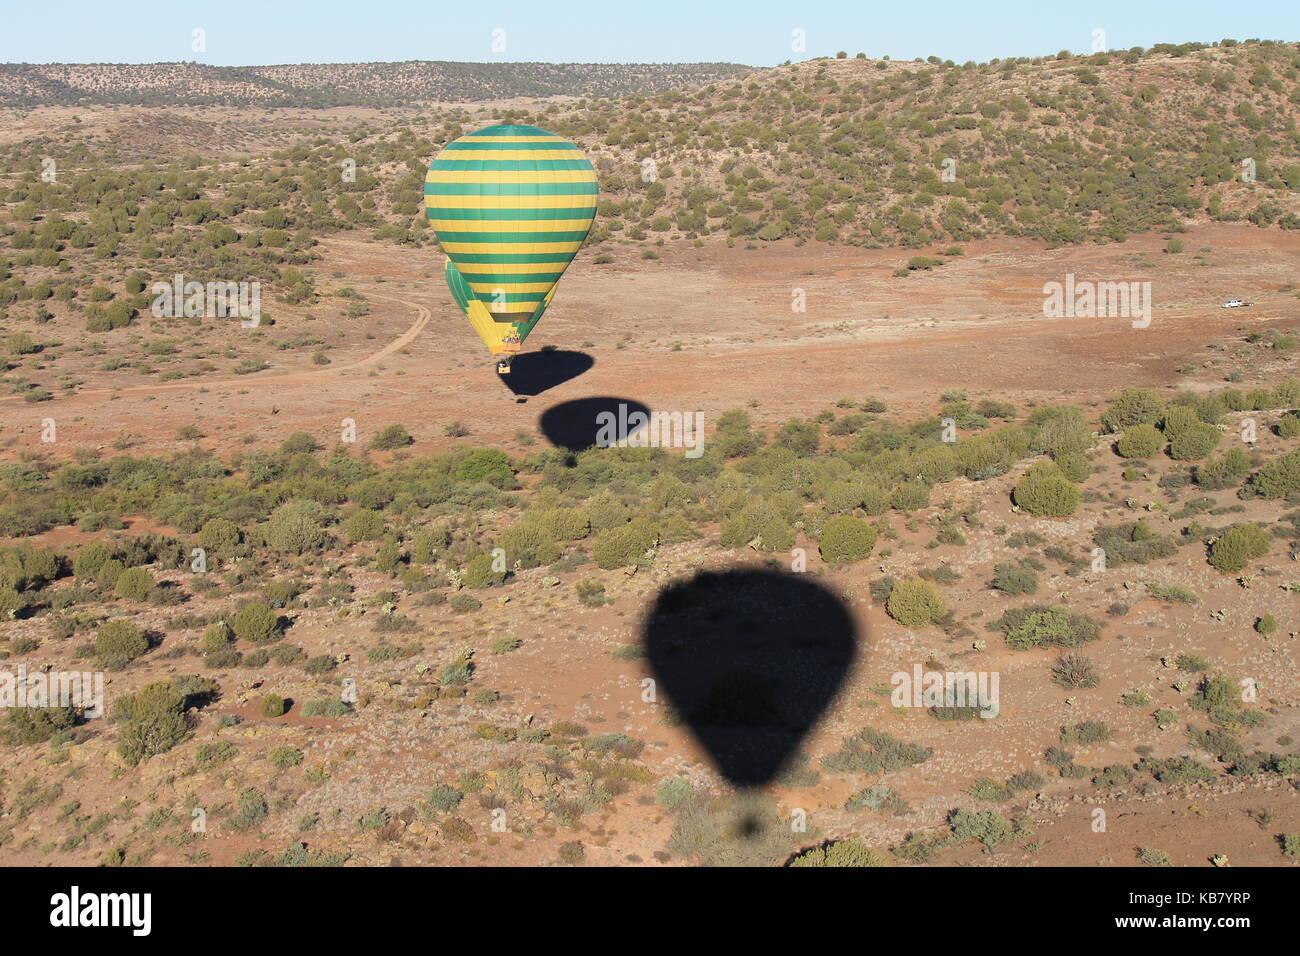 balloon ride Stock Photo